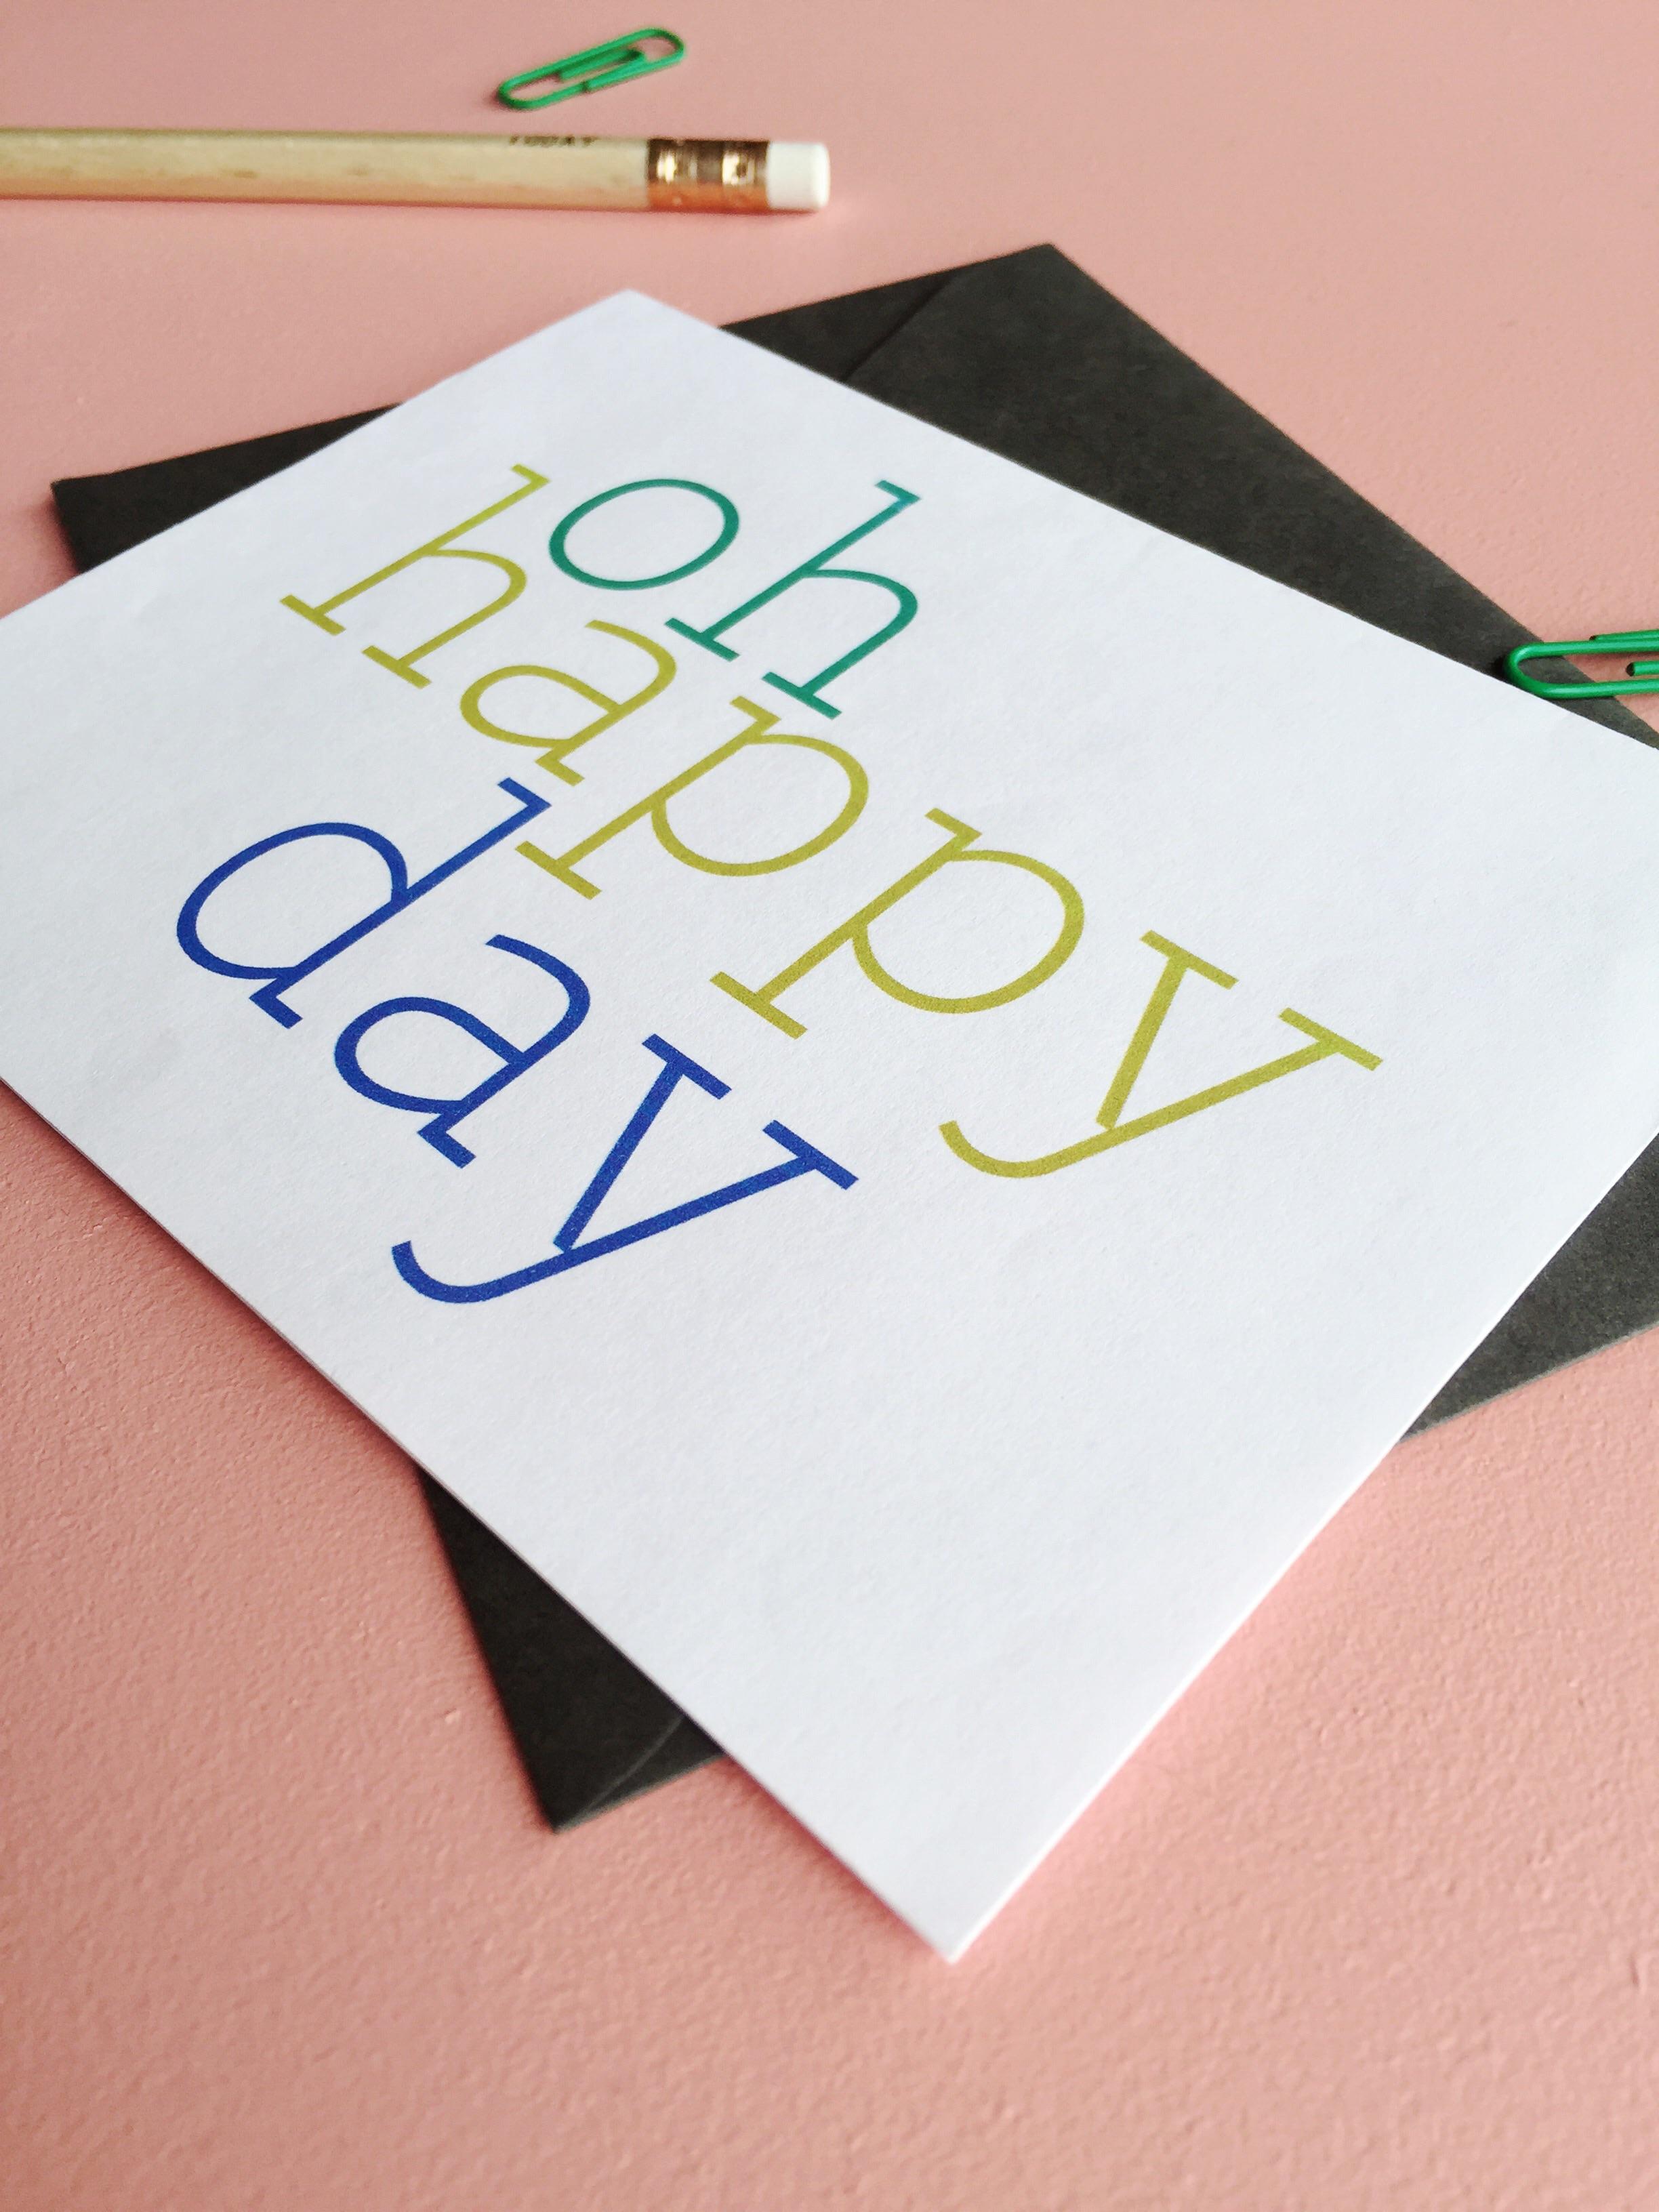 Download, print, cut, fold. Free printable card.